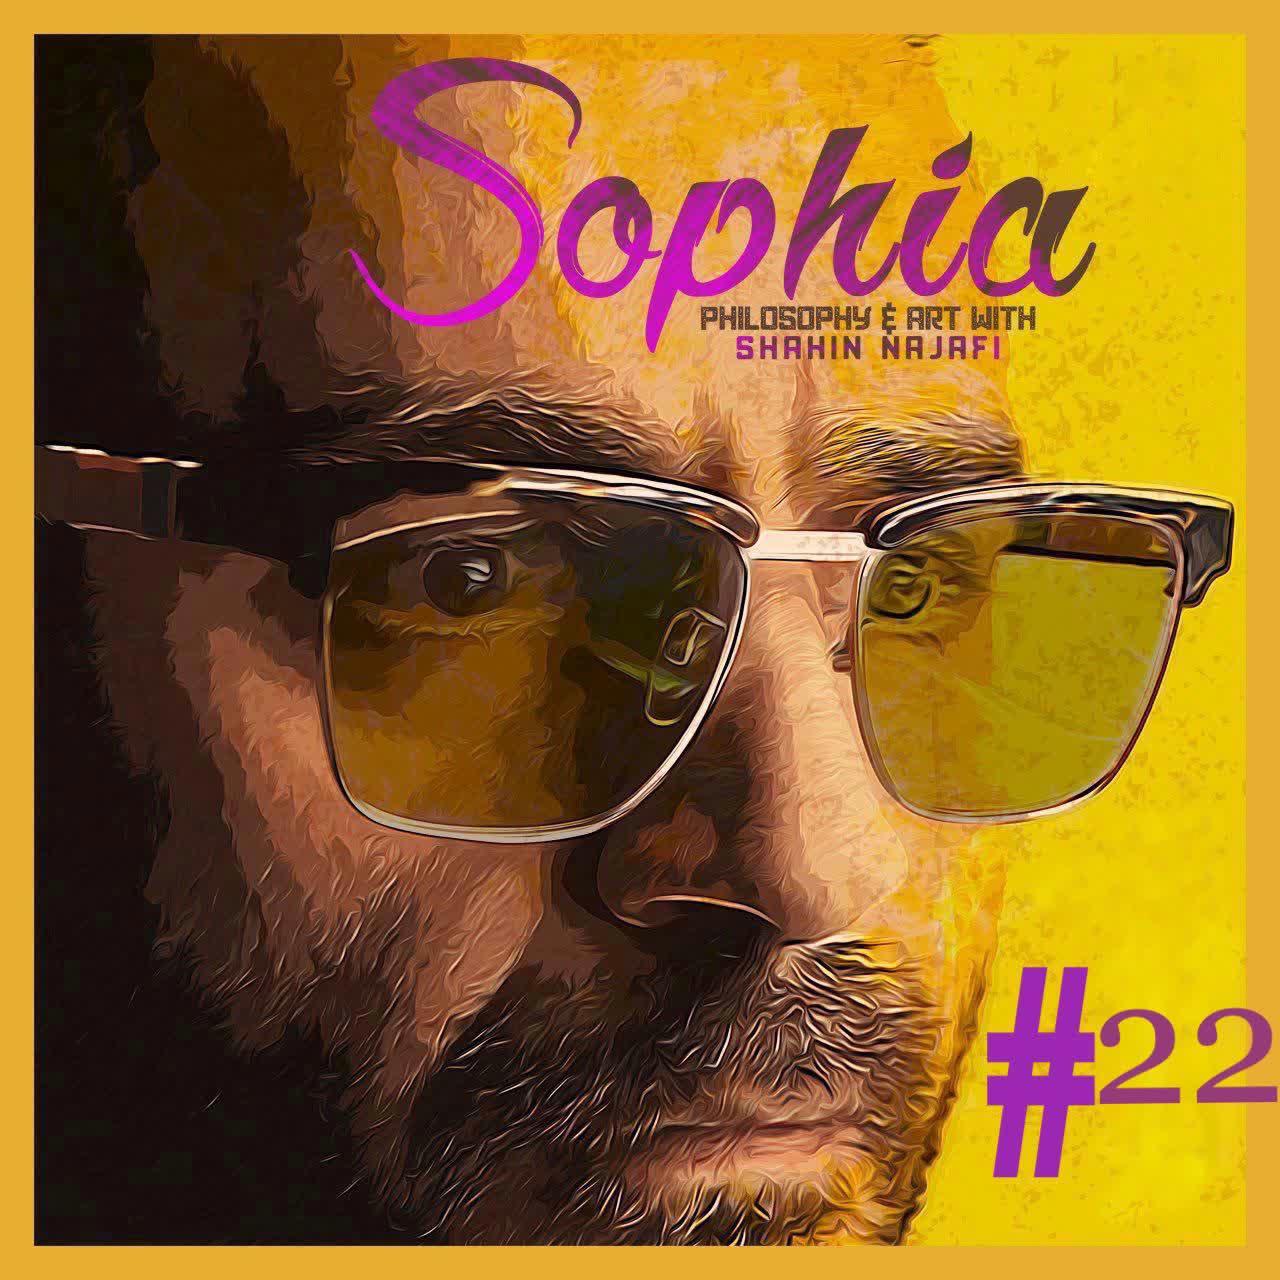 Sophia #22 Shahin Najafi & Mehrdad Farid سوفیا ۲۲  شاهین نجفی و مهرداد فرید